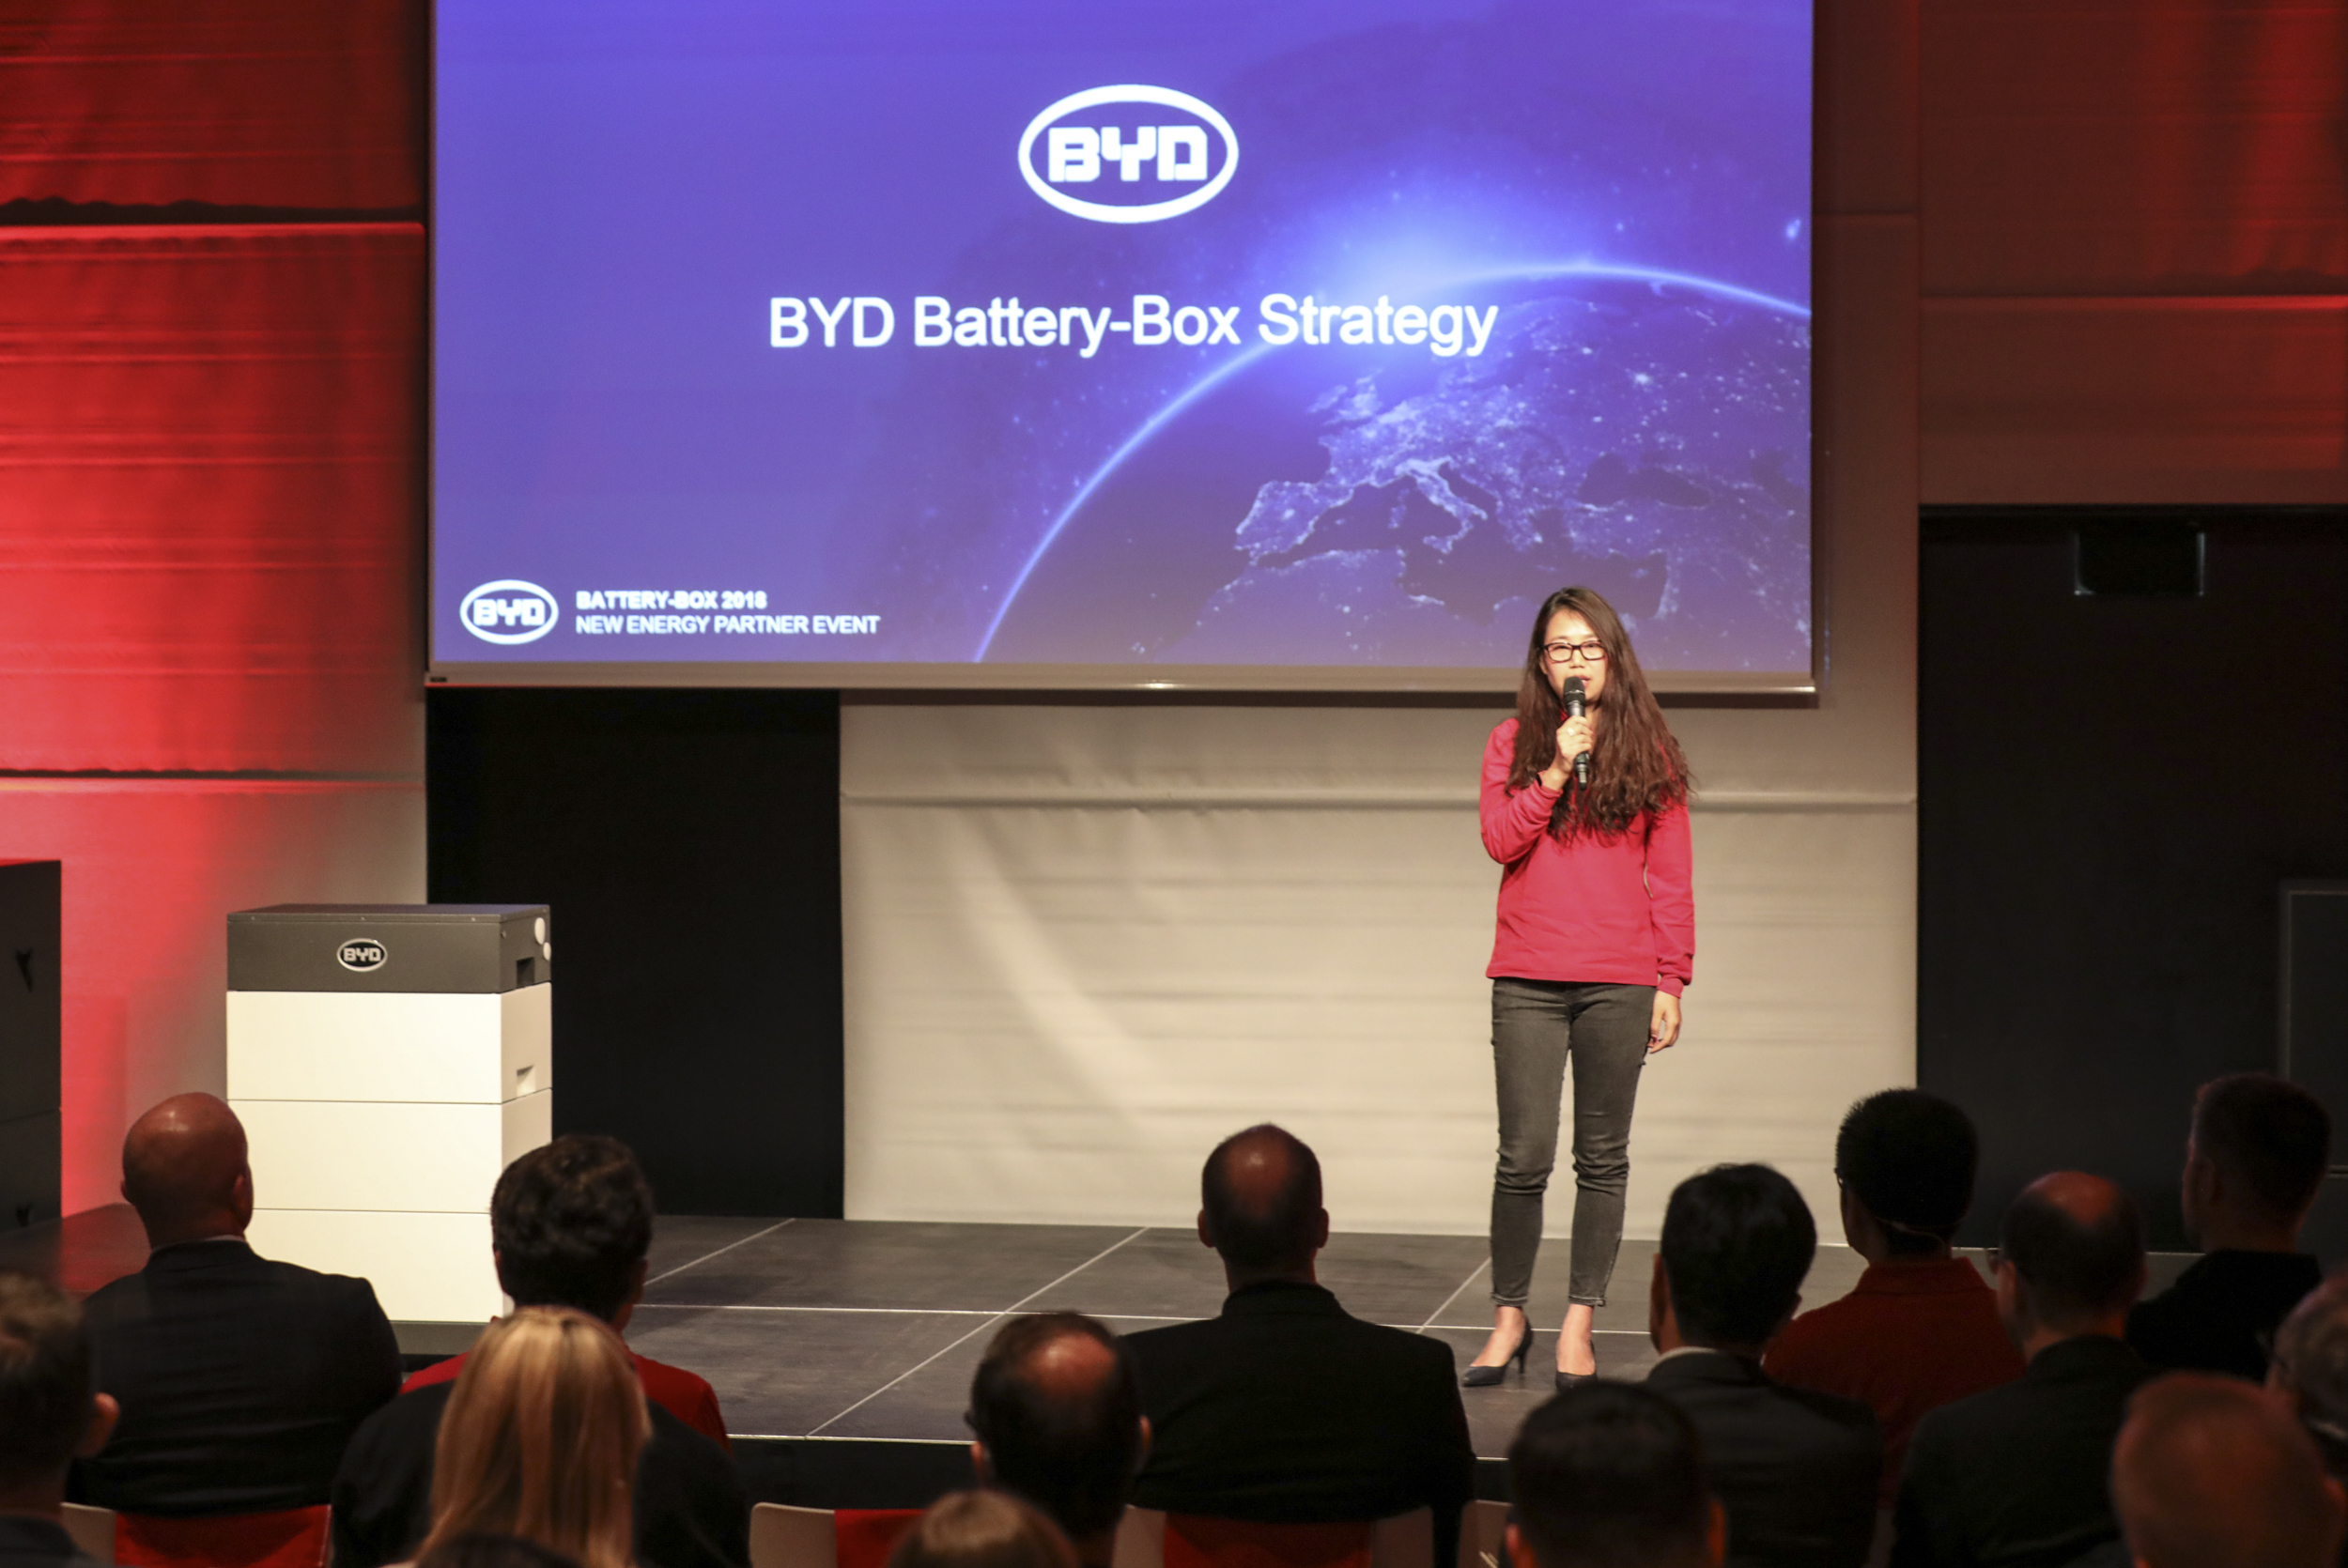 Julia Chen, Global Sales Director BYD Batteries